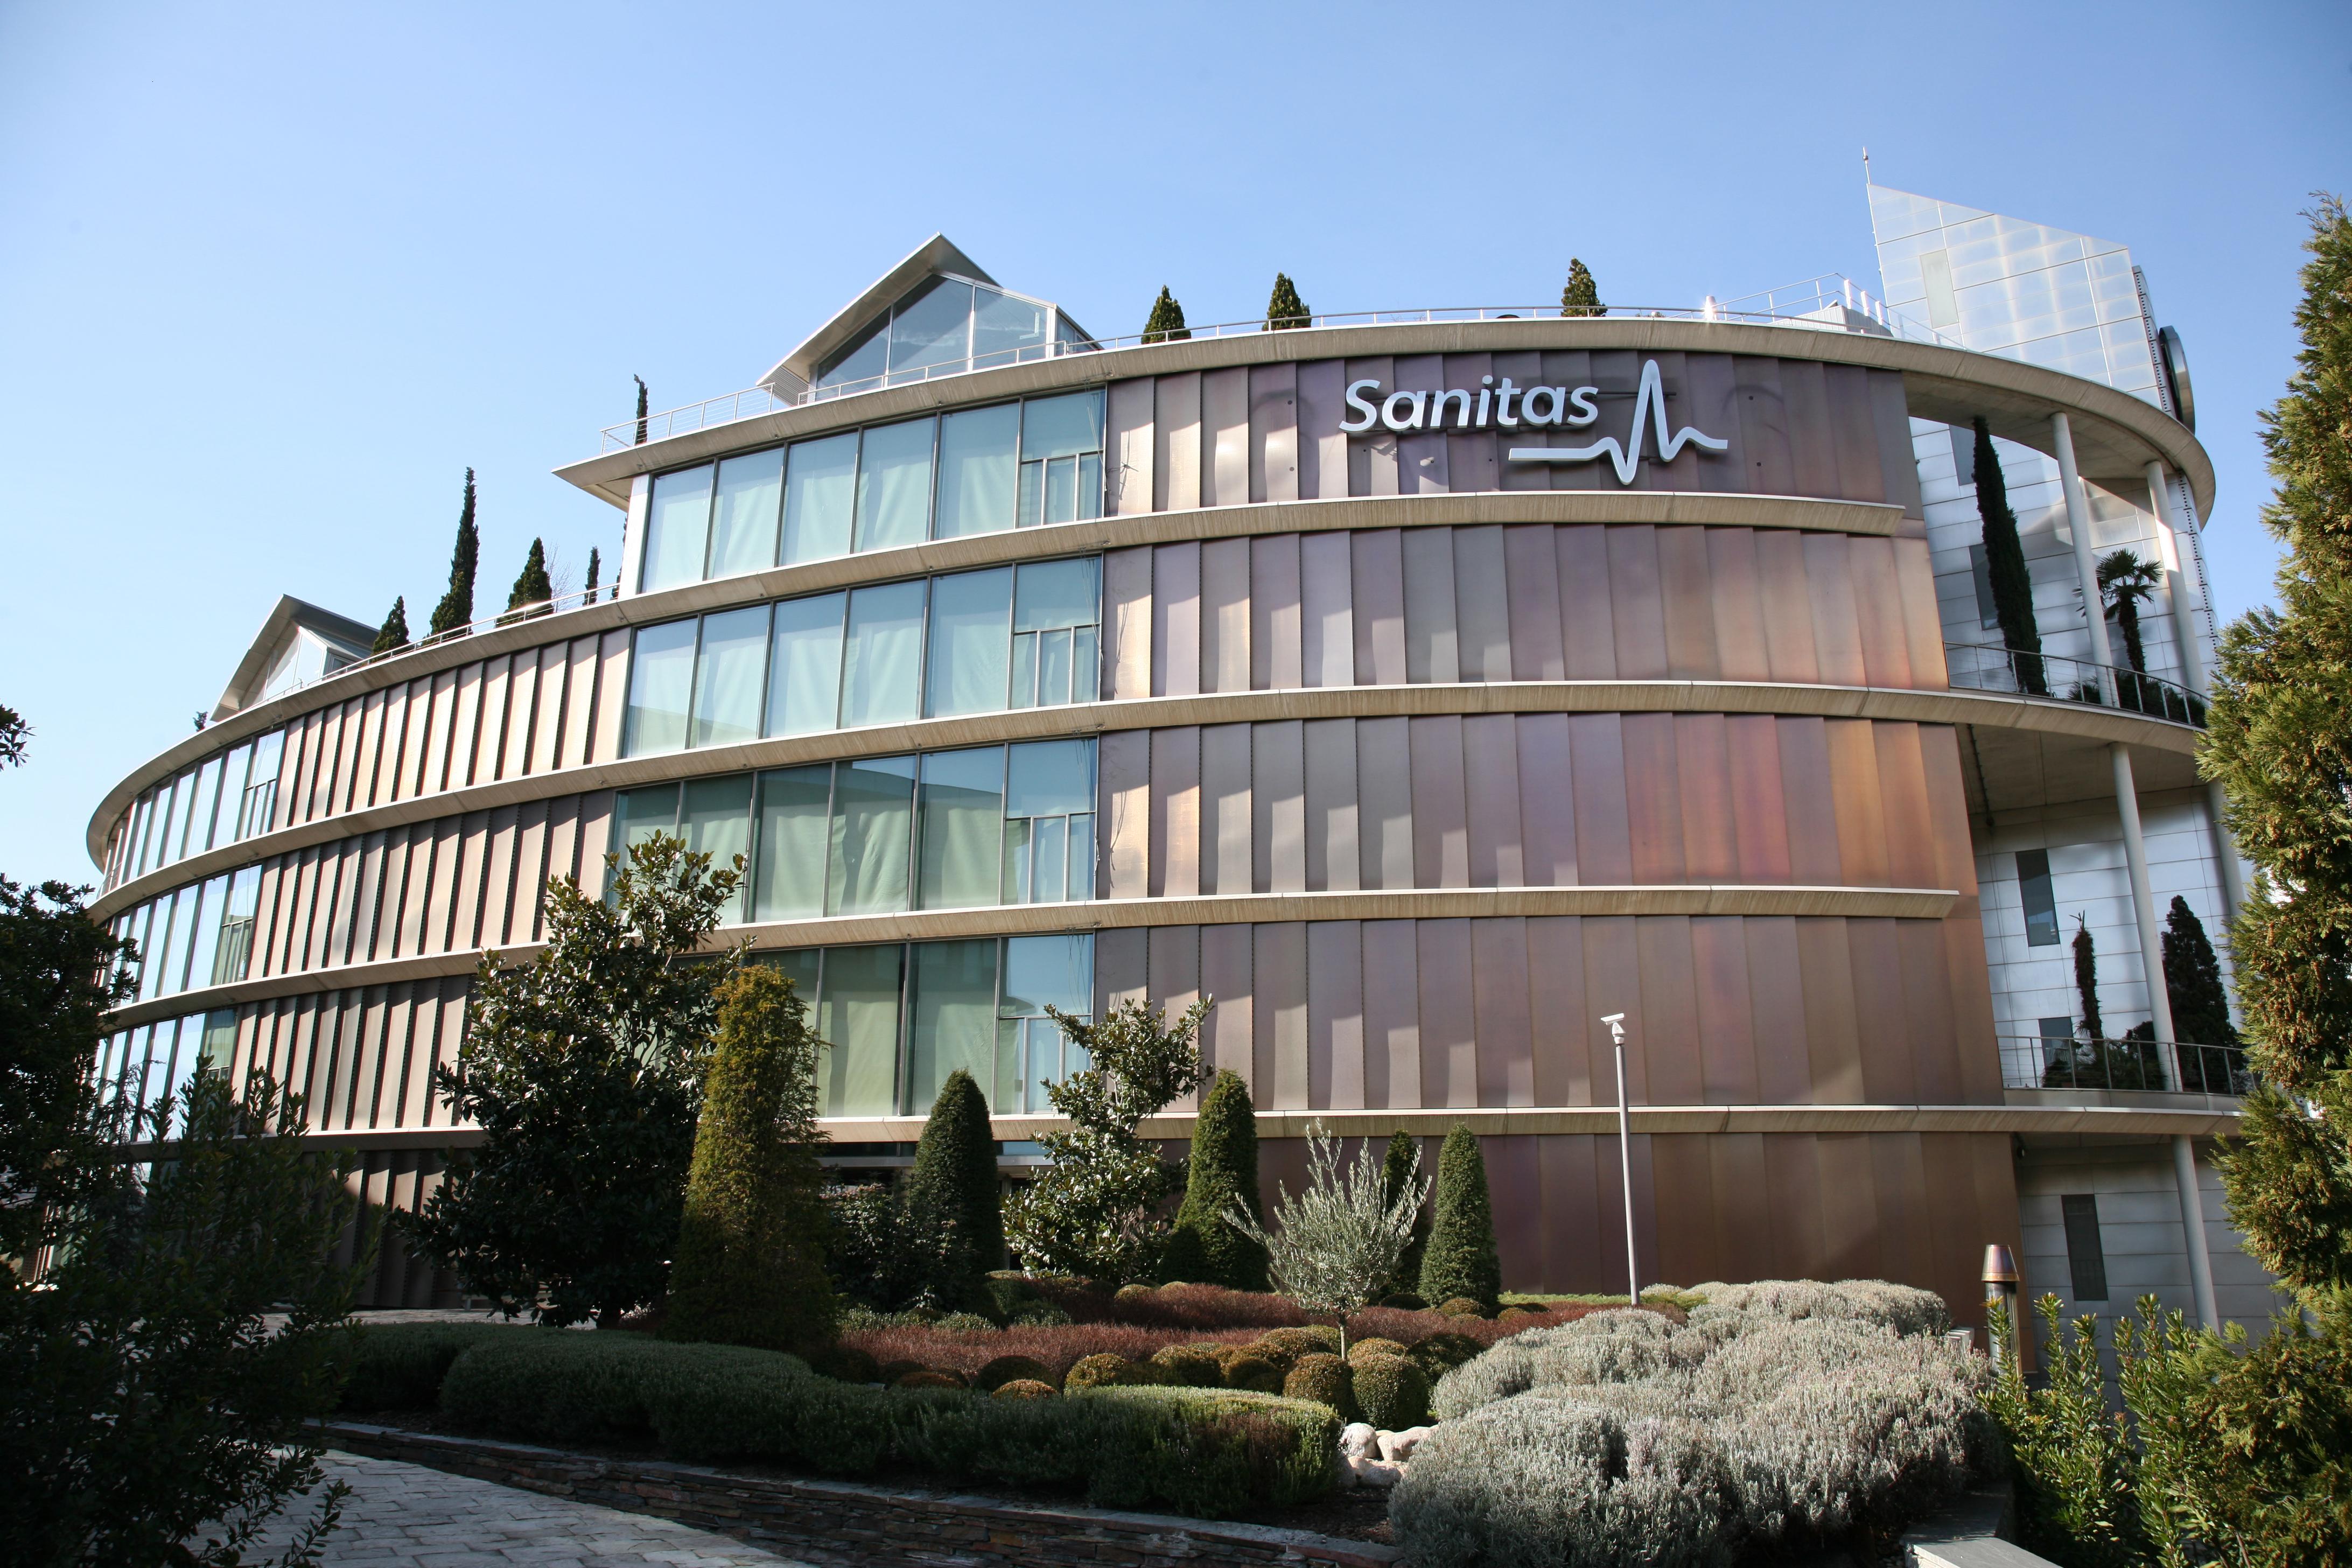 hospitales de sanitas en madrid: